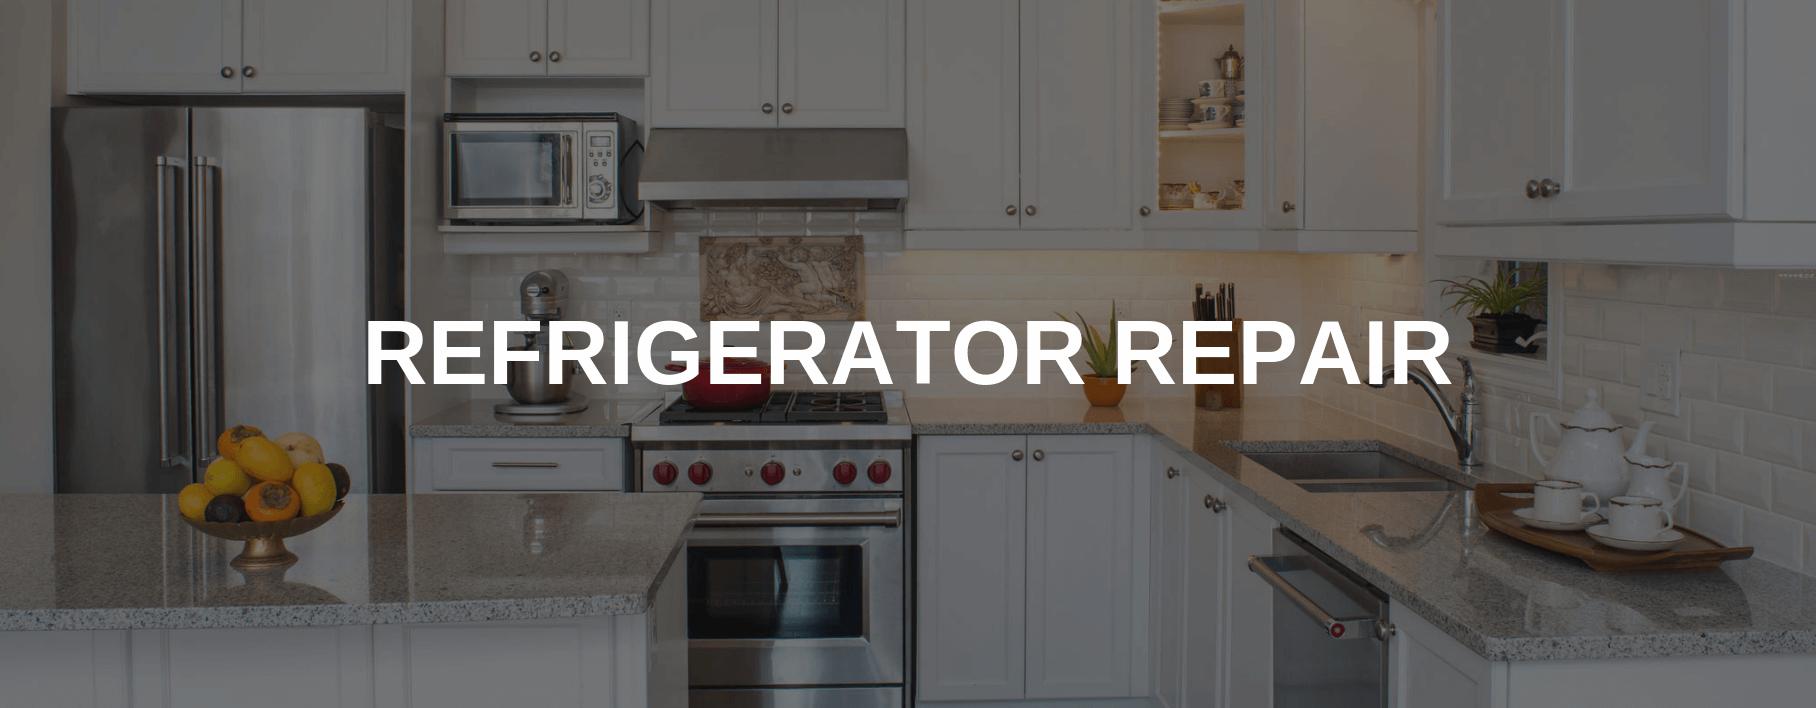 pomona refrigerator repair